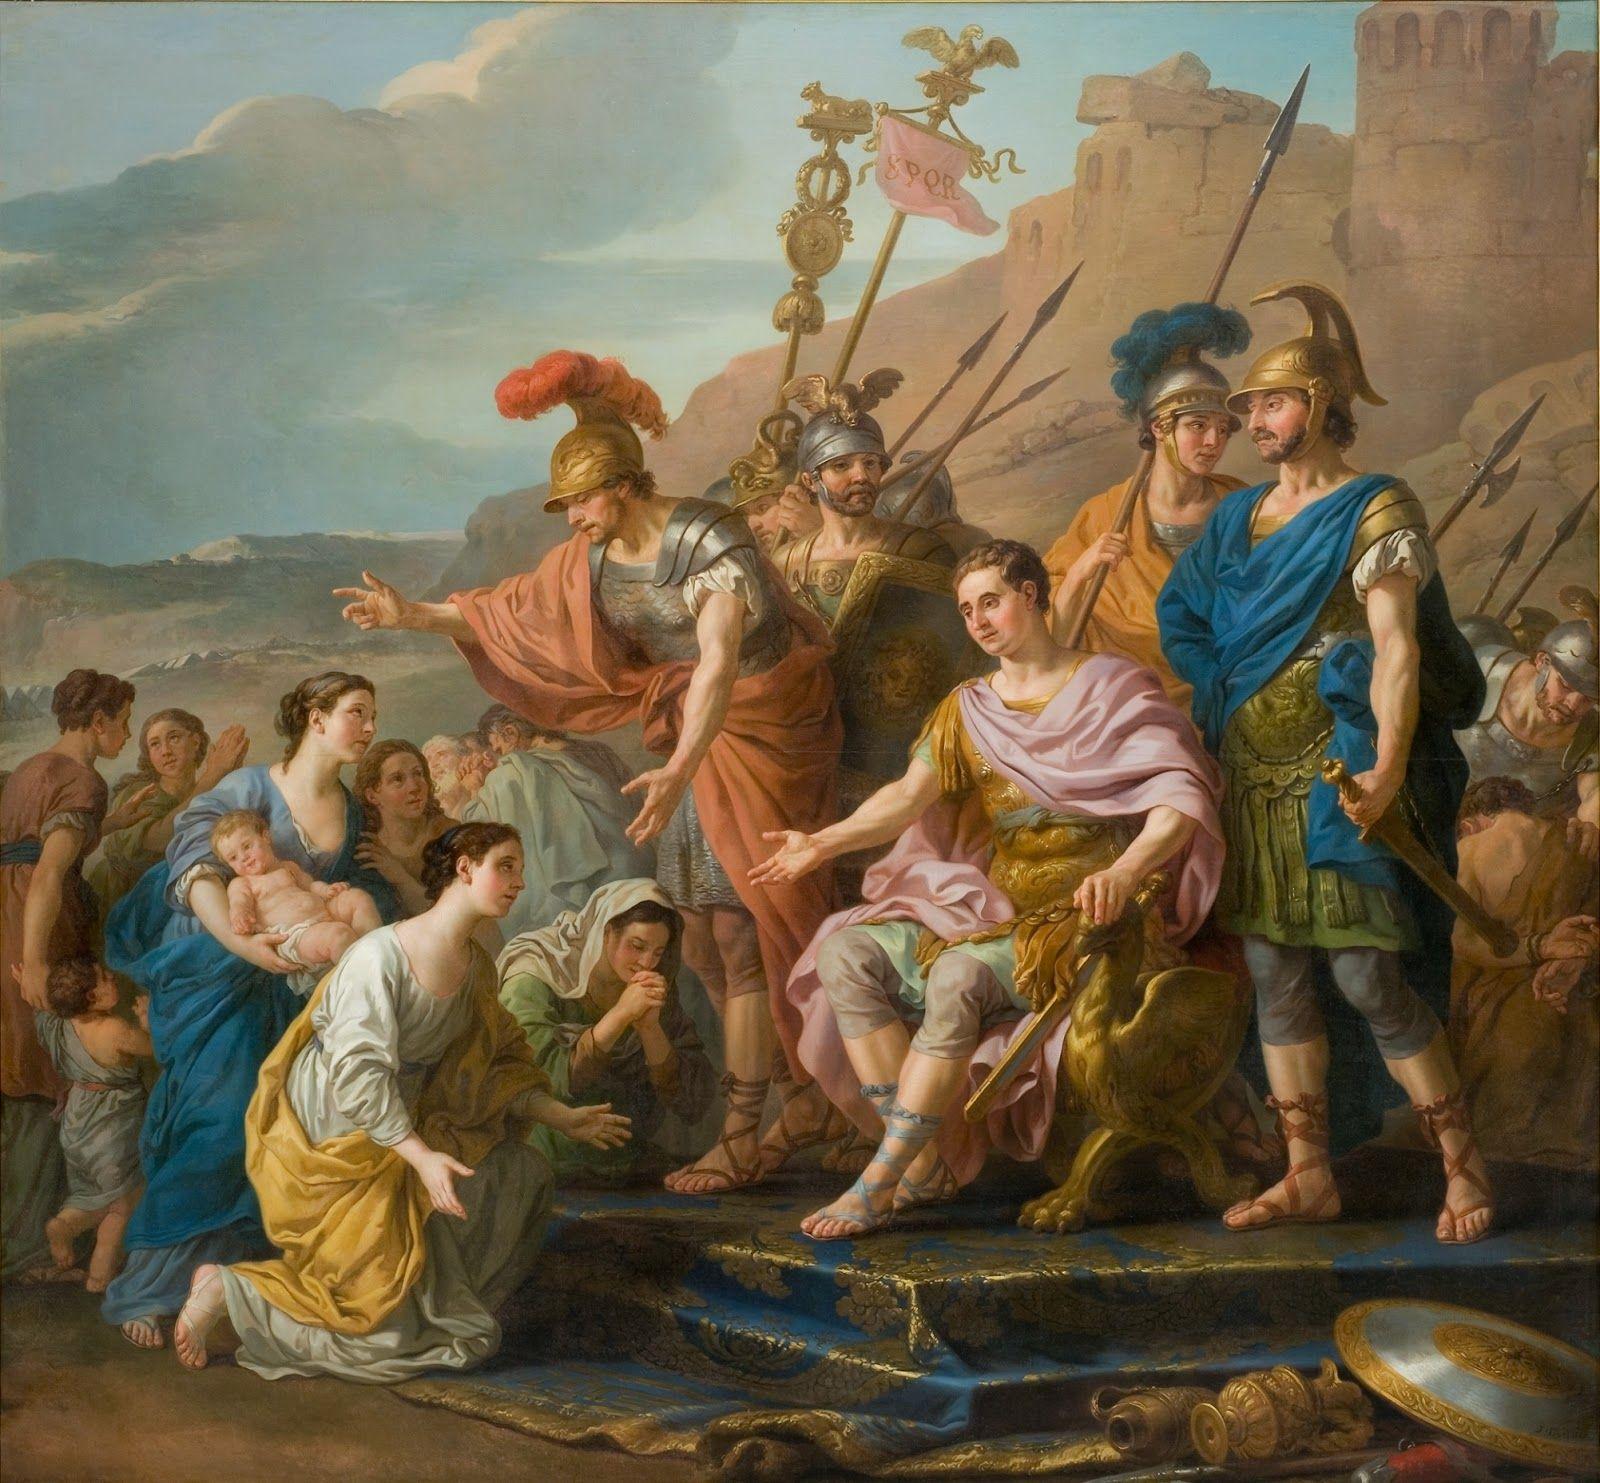 FRENCH PAINTERS: Joseph-Marie VIEN Coriolans Family Imploring him not to Besiege Rome